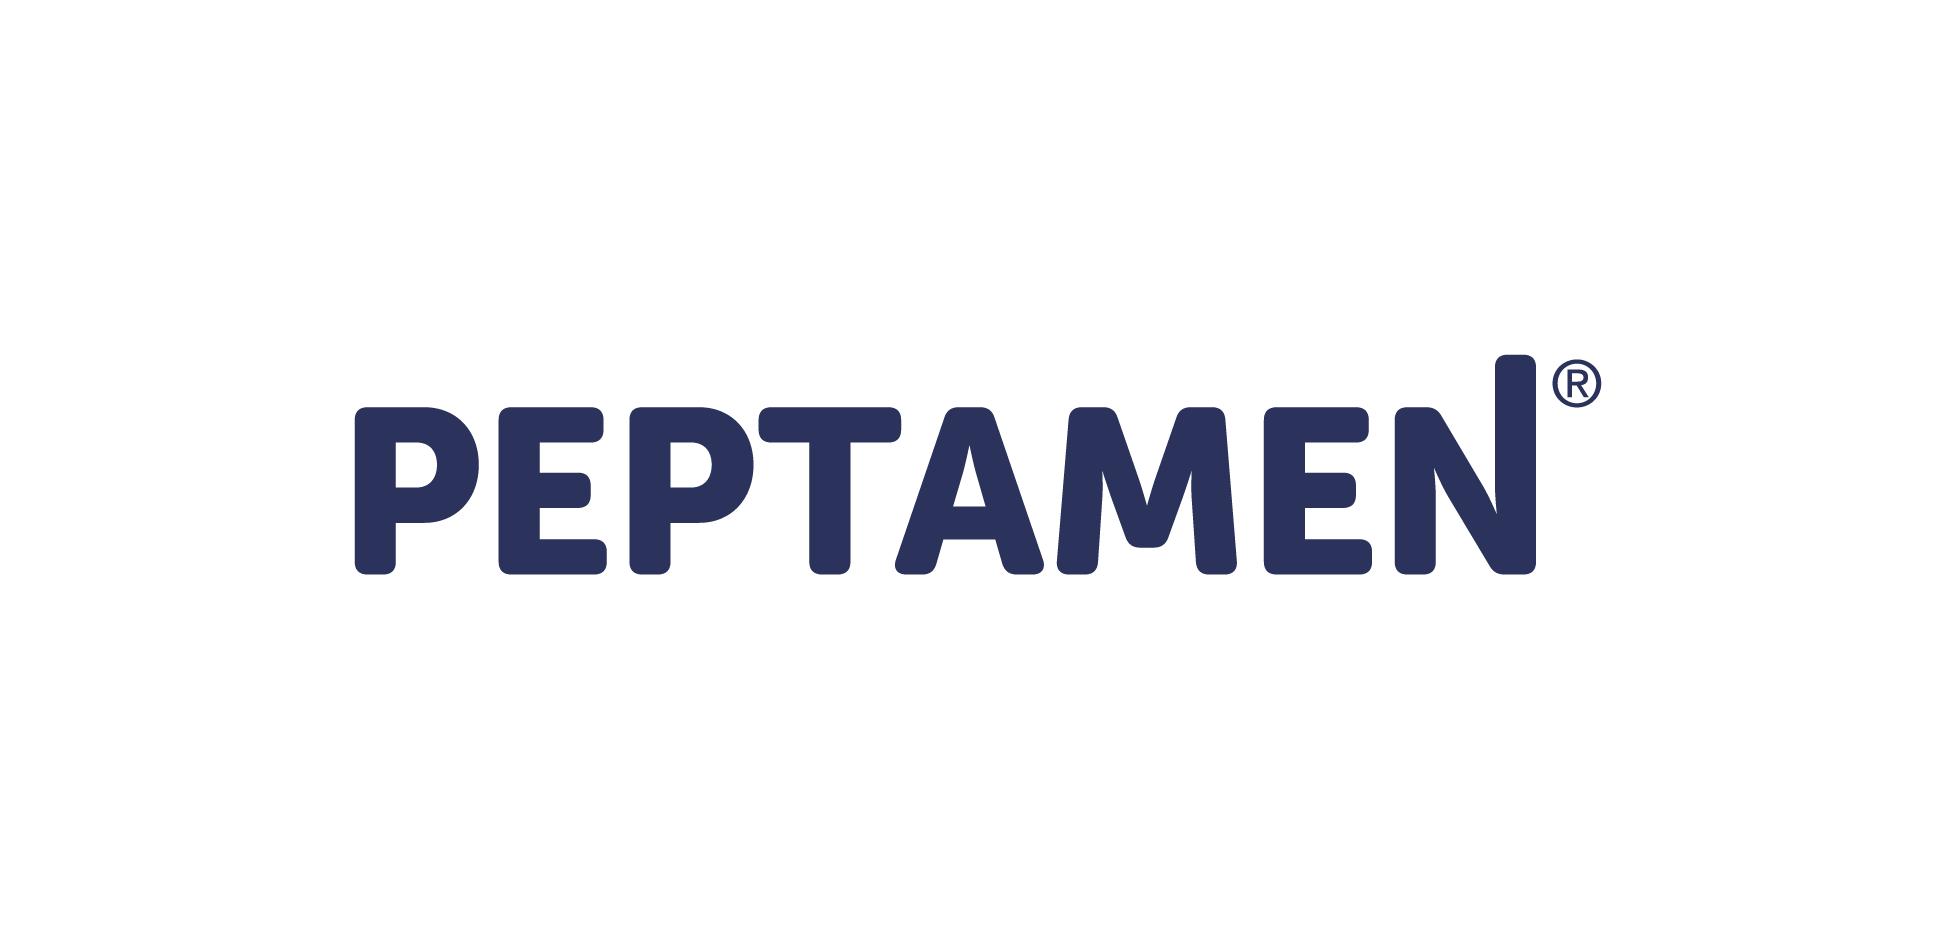 PEPTAMEN(1)